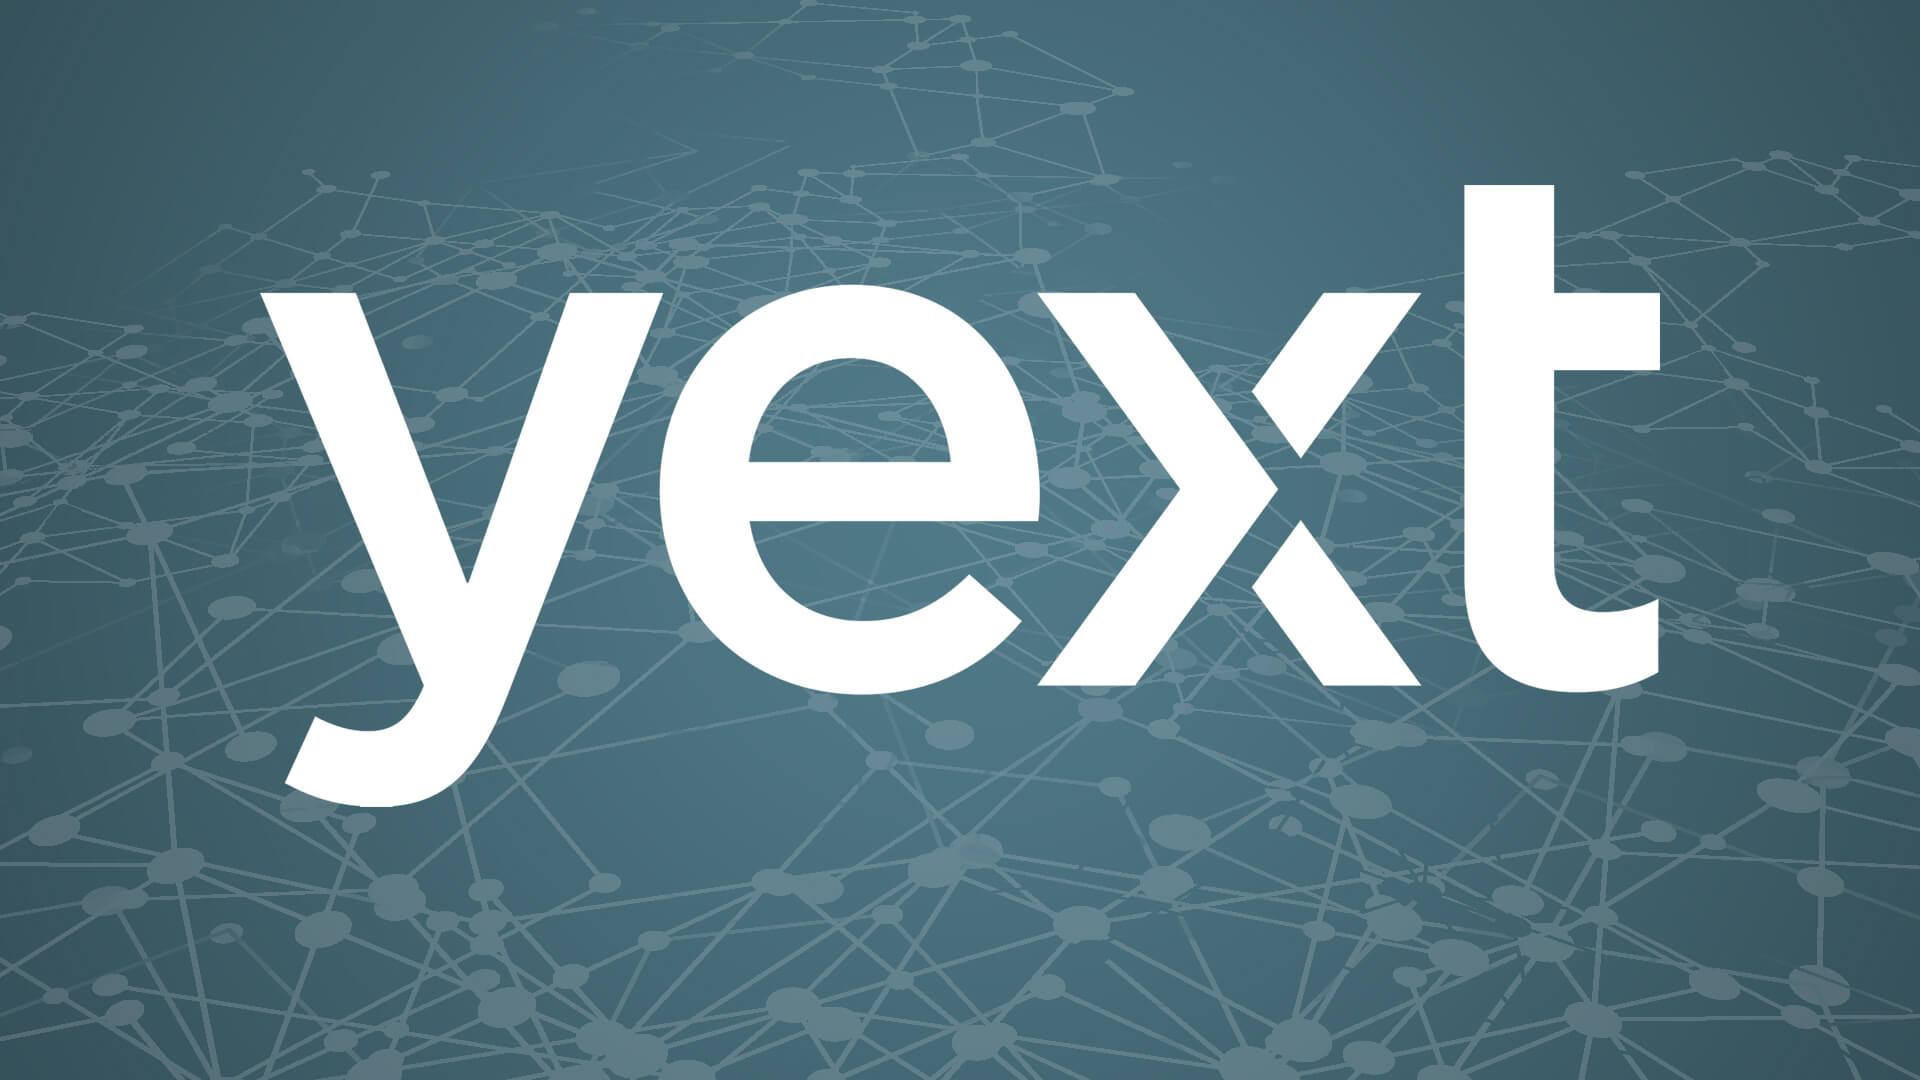 Yext solicita una oferta pública inicial de $ 100 millones